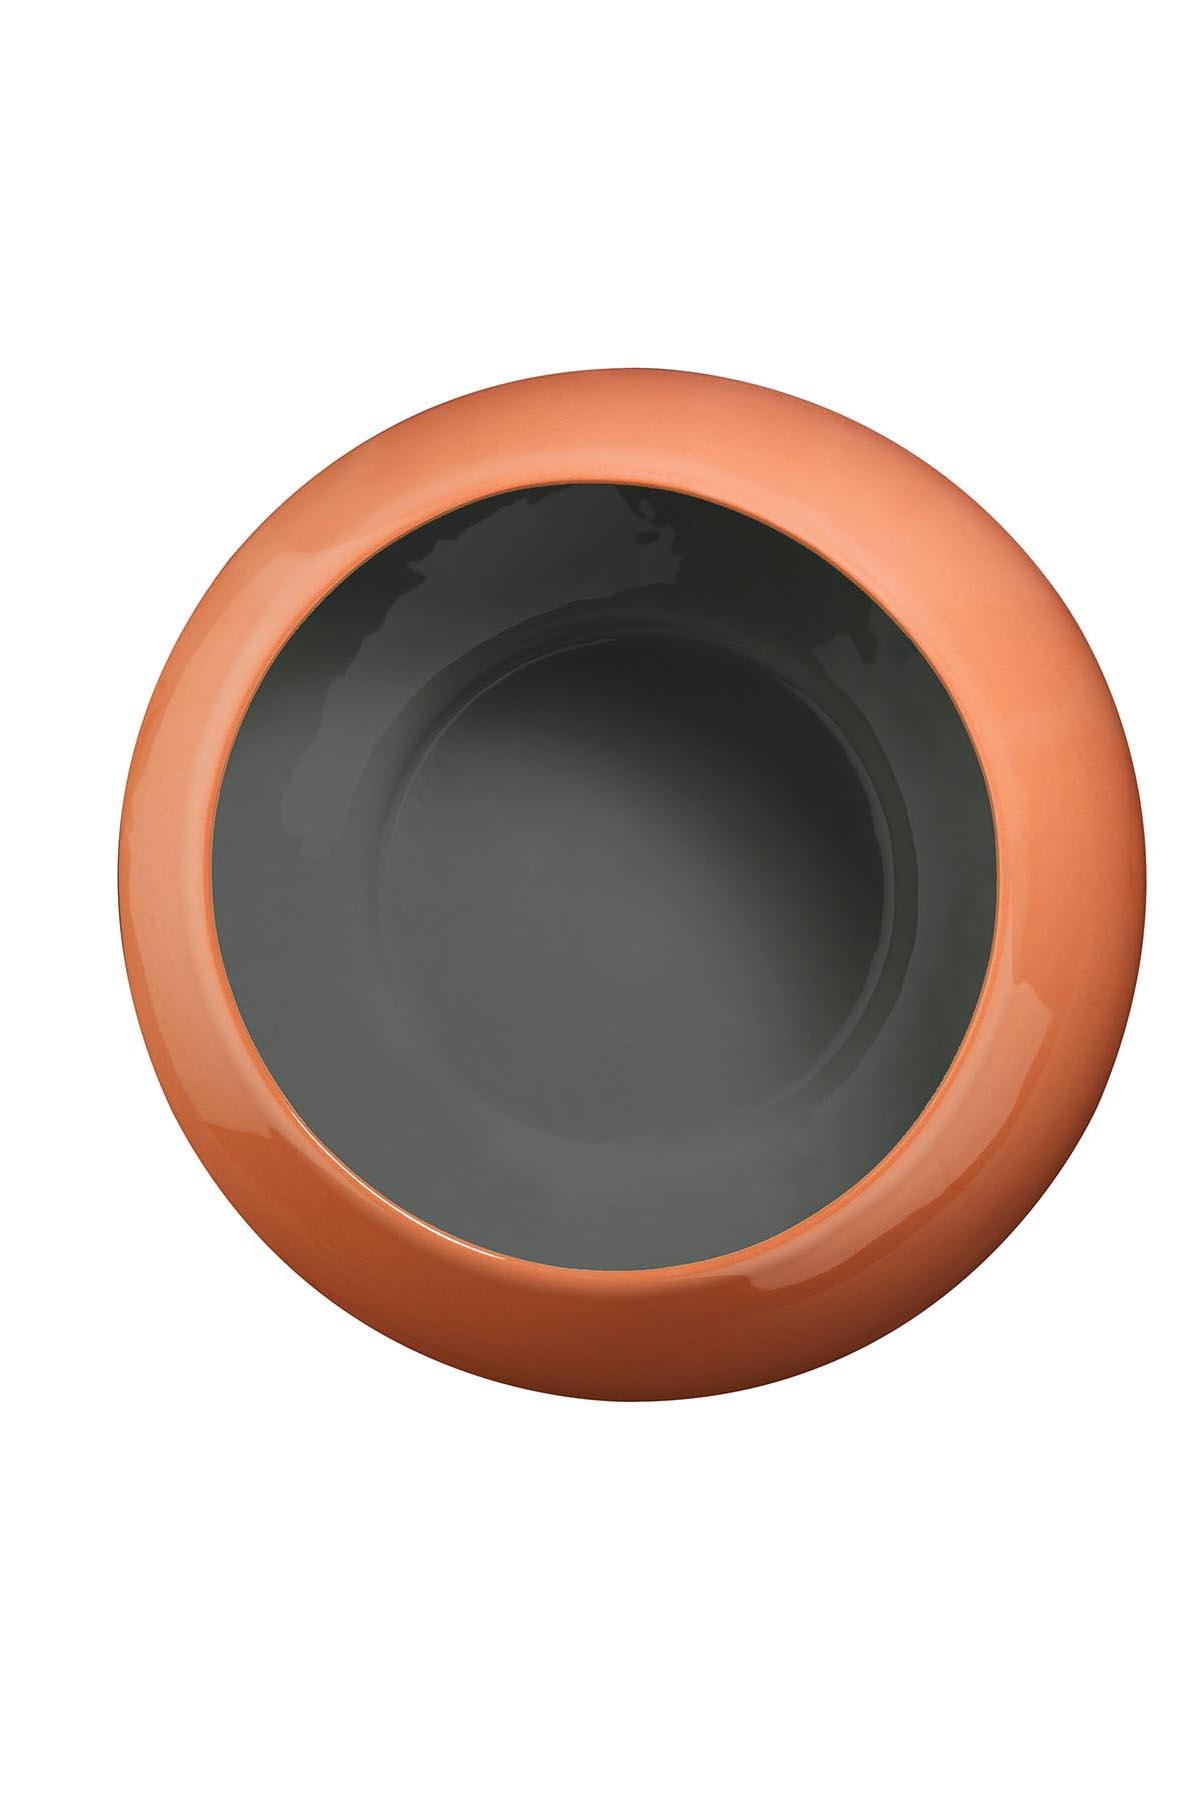 Aura 23 cm Kase 3 Renkli Yeşil-Kırmızı-Siyah